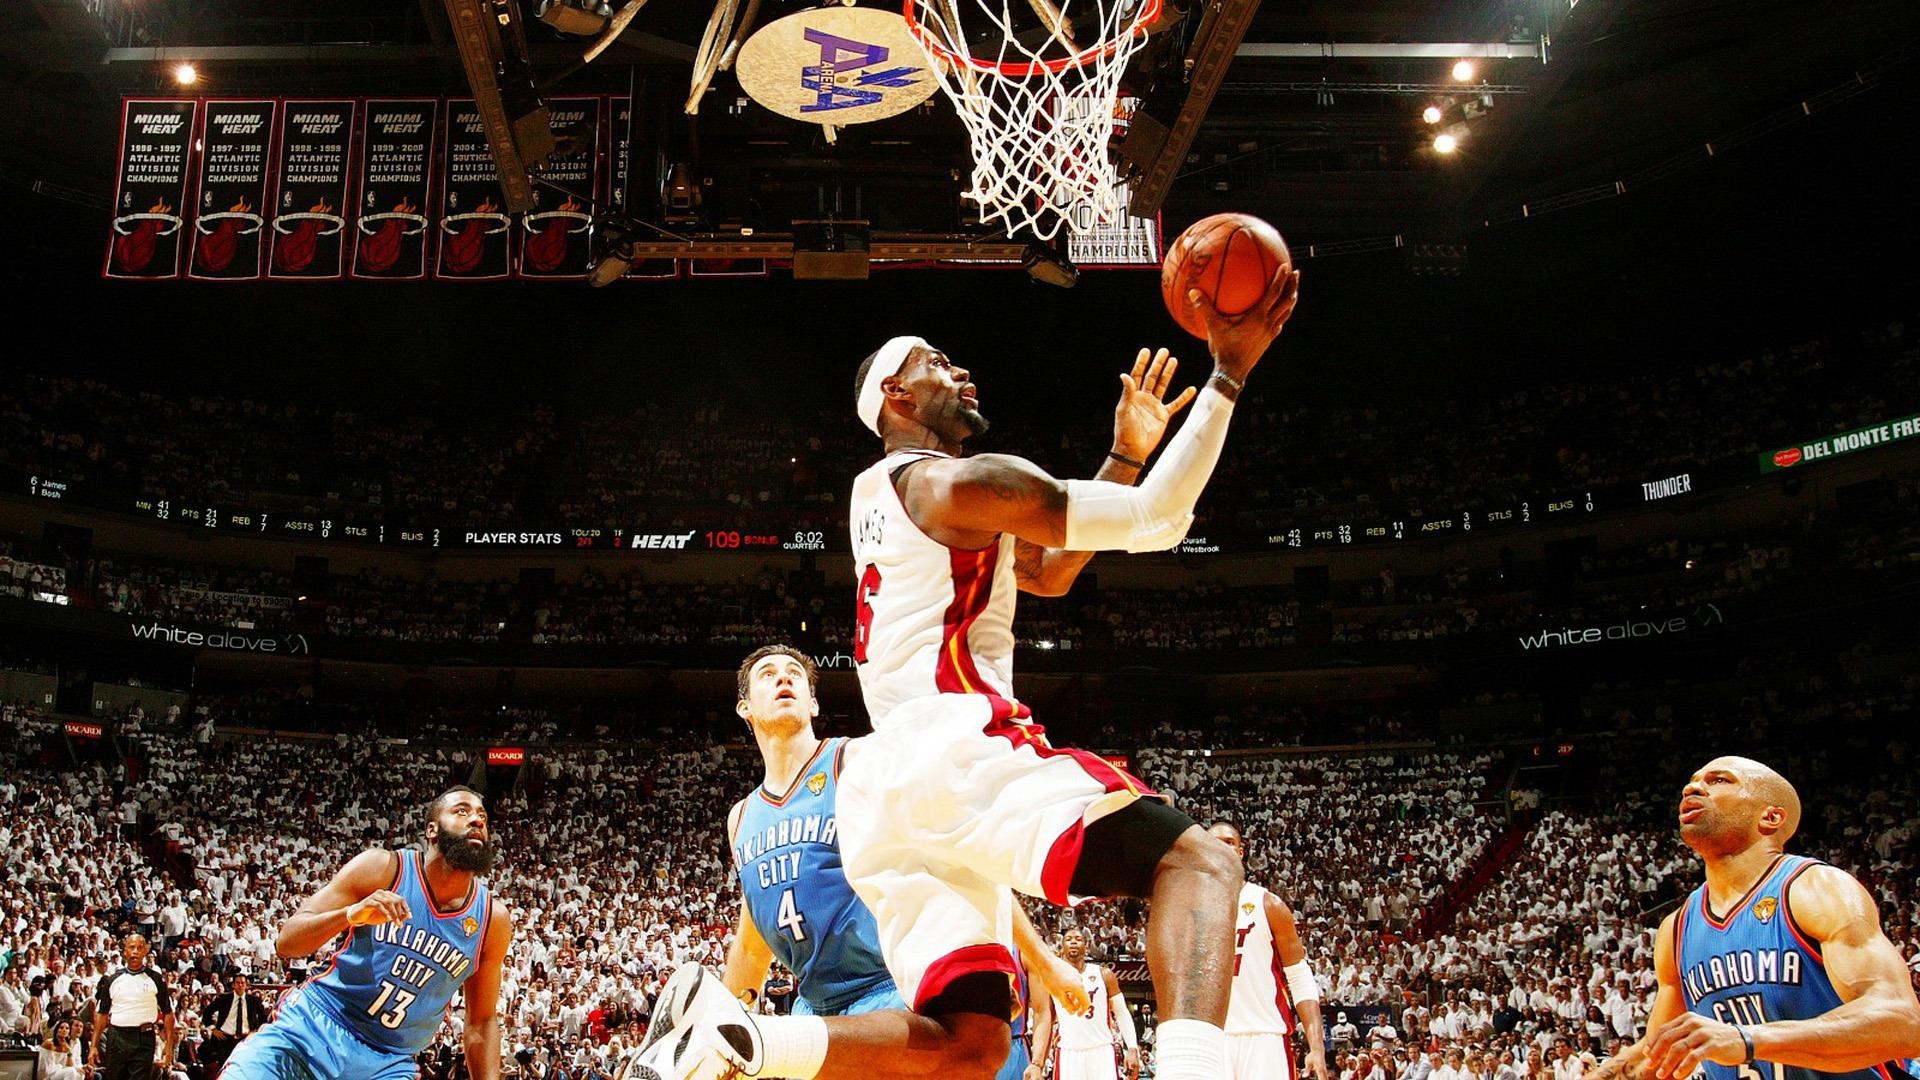 Top Free Dope Nba Backgrounds: LeBron James-NBA2011-12 Champion Heat Wallpaper-1920x1080